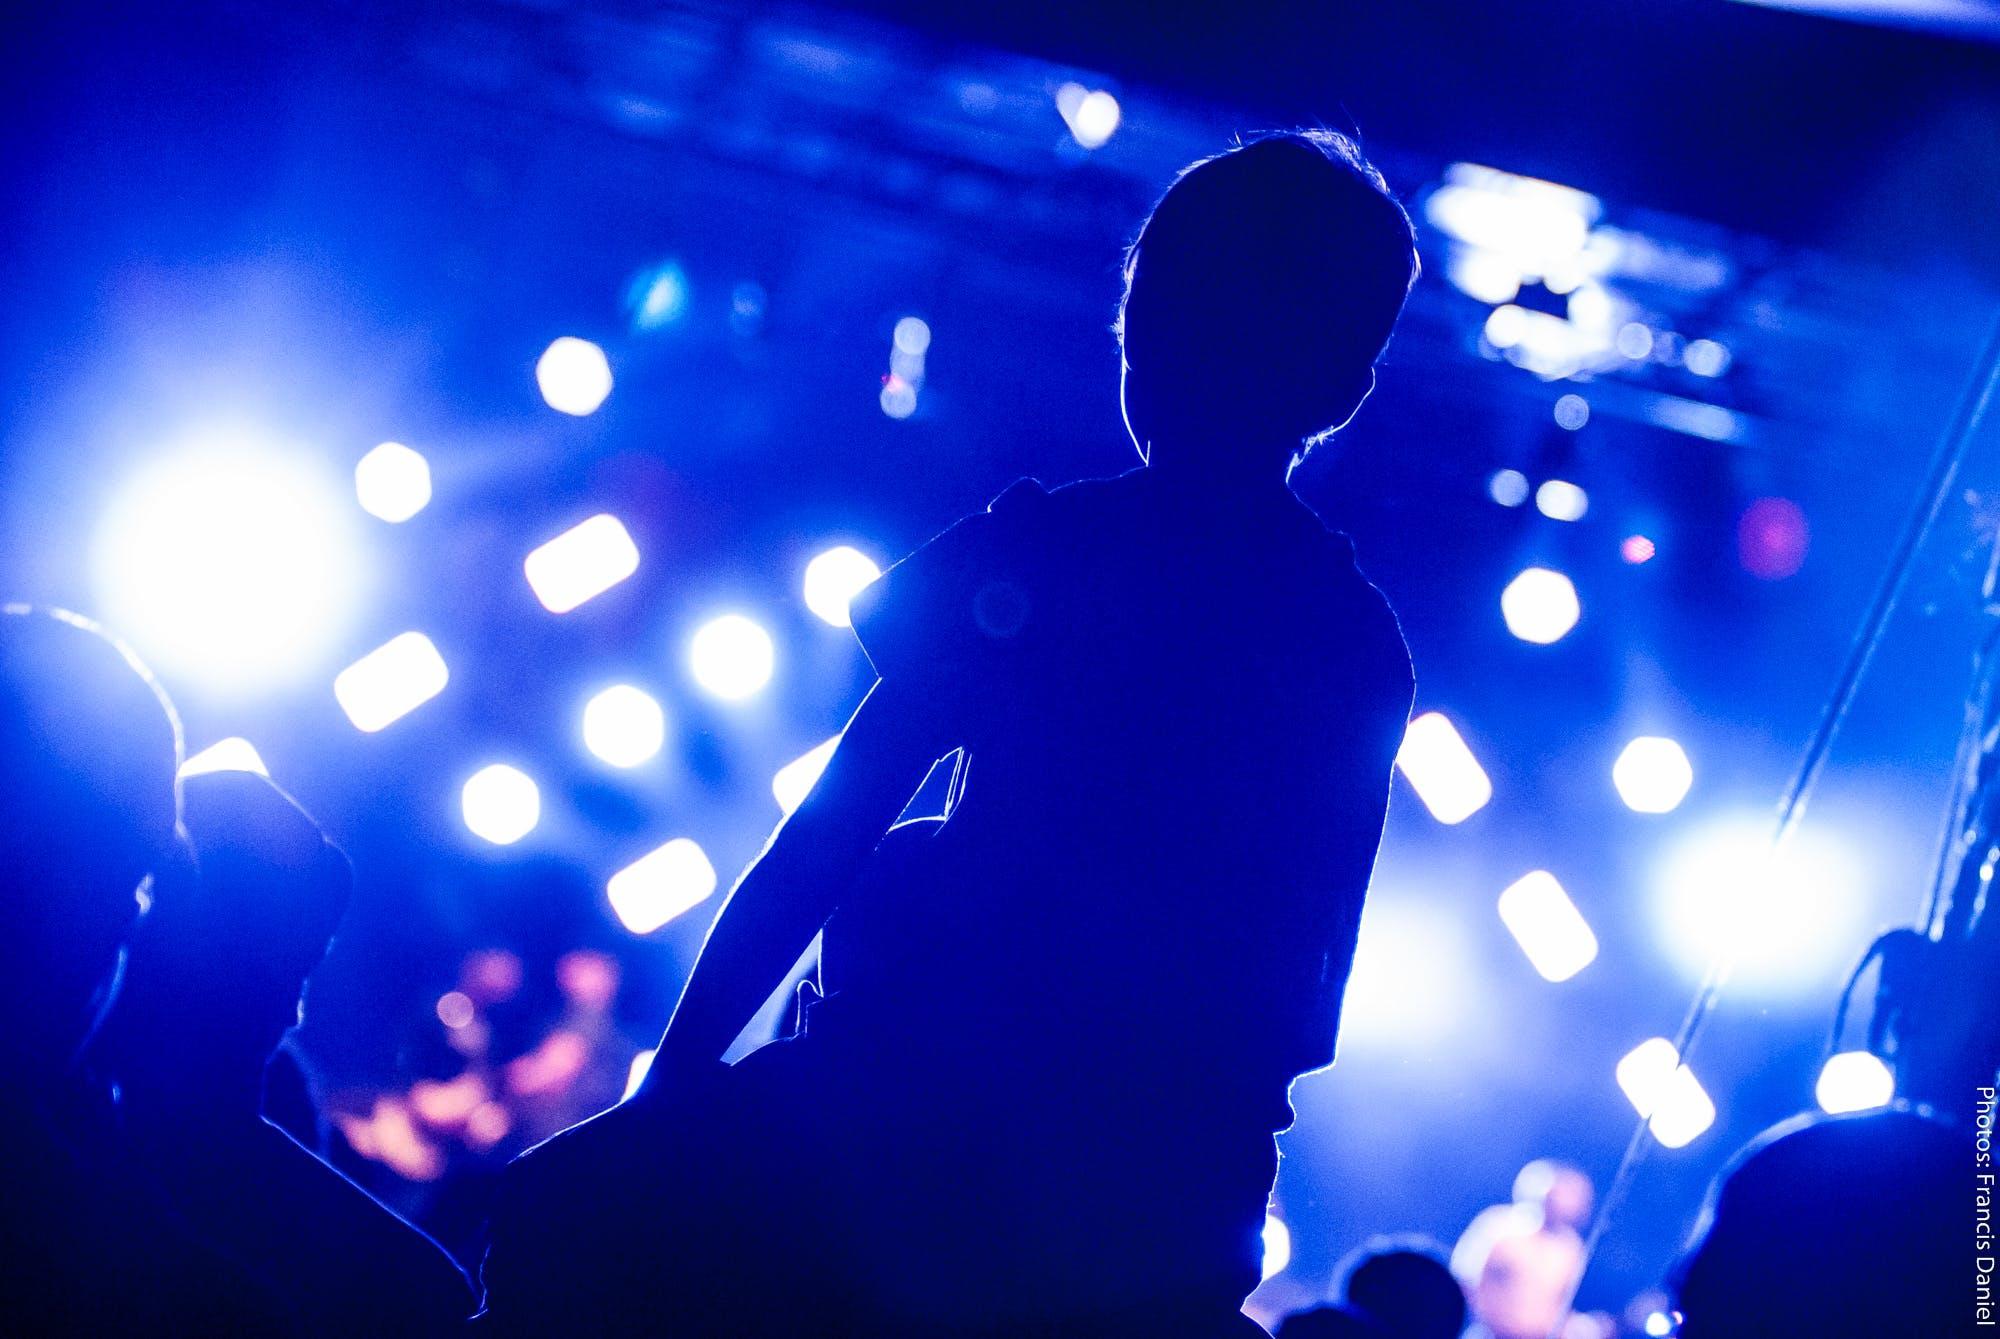 Kostenloses Stock Foto zu mann, menschen, beleuchtung, festival